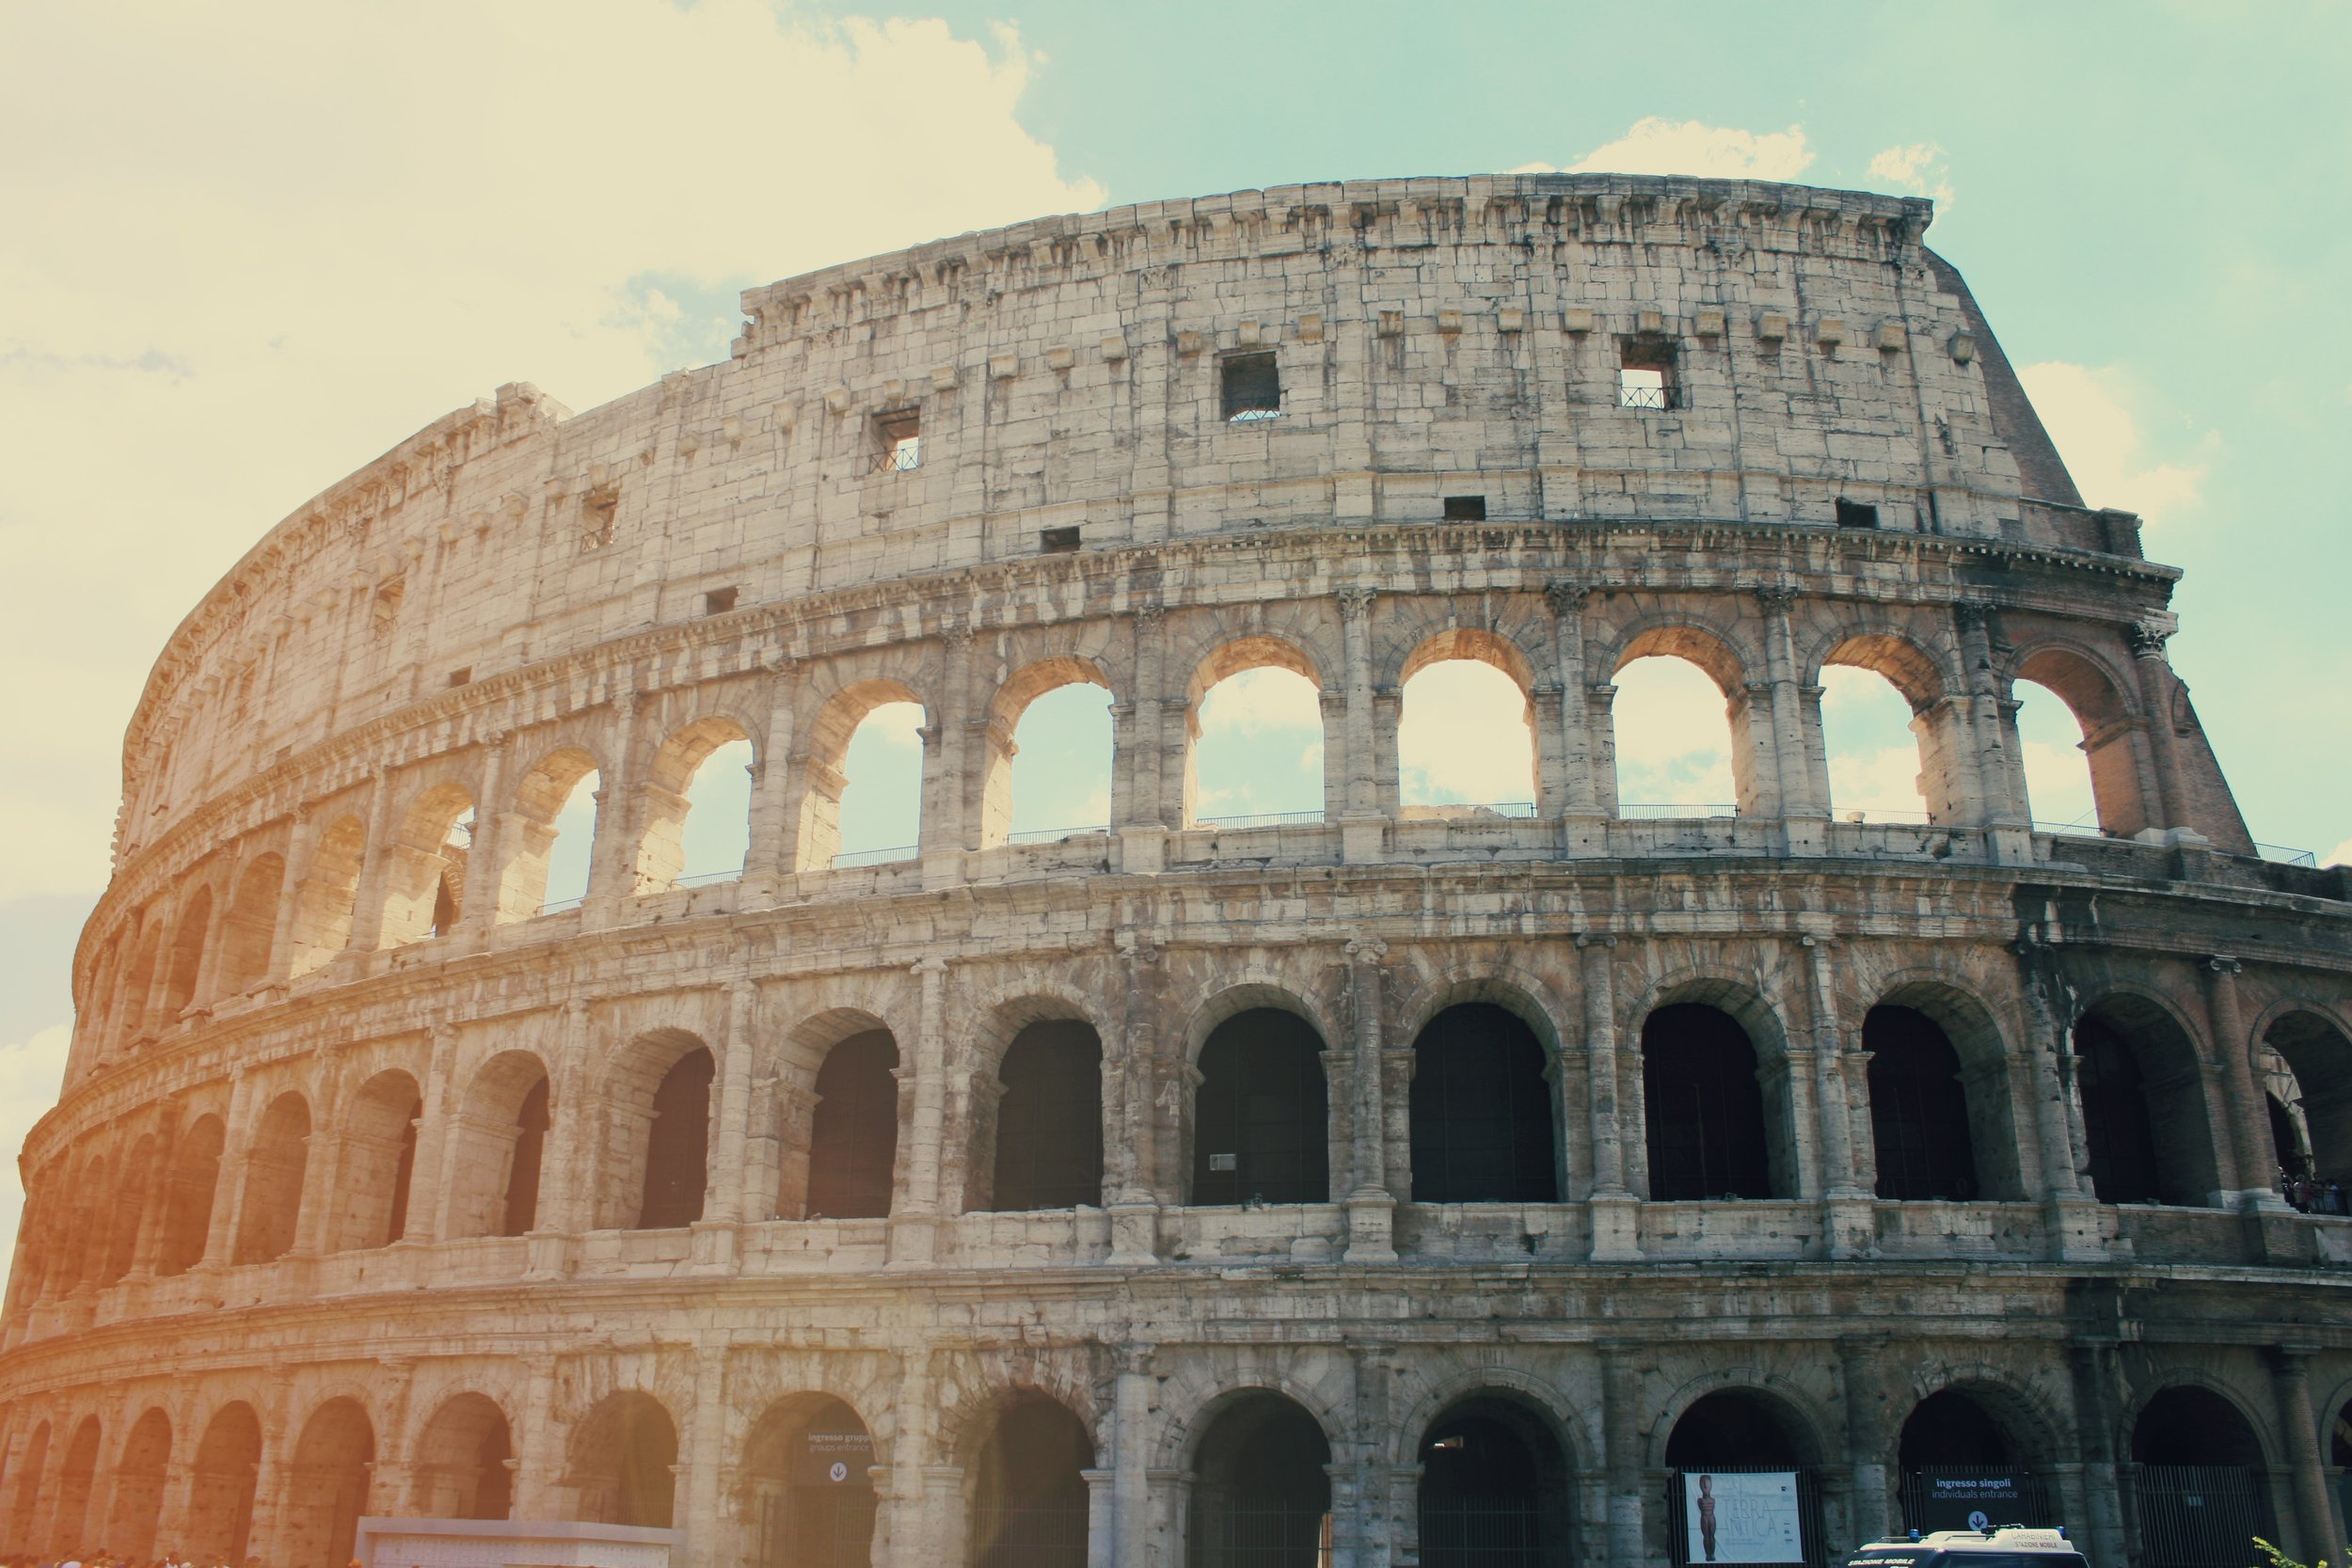 architecture-coliseum-colosseum-10922.jpg